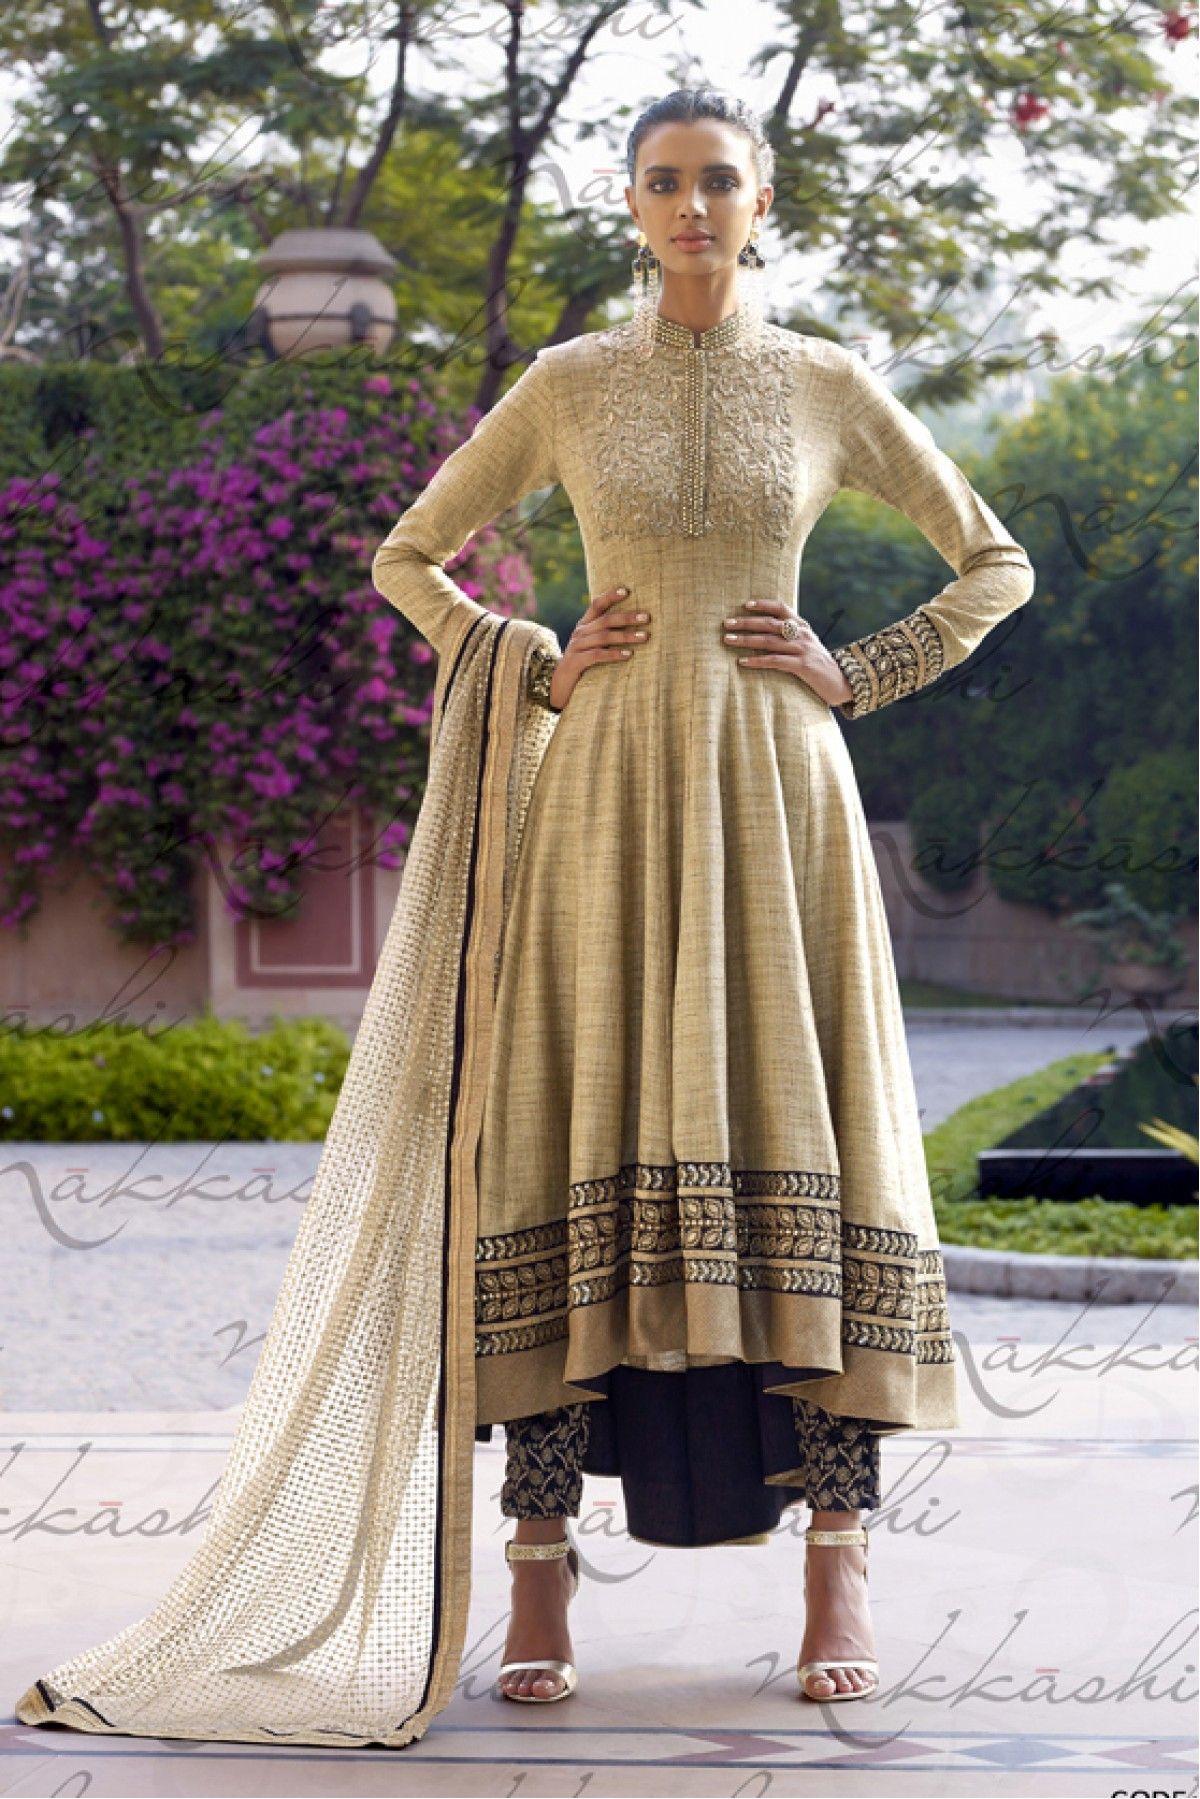 Designer salwar kameez mesmeric peach color net designer suit - Beige Colour Khadi Silk And Santoon Fabric Designer Semi Stitched Salwar Kameez Comes With Matching Jacquard